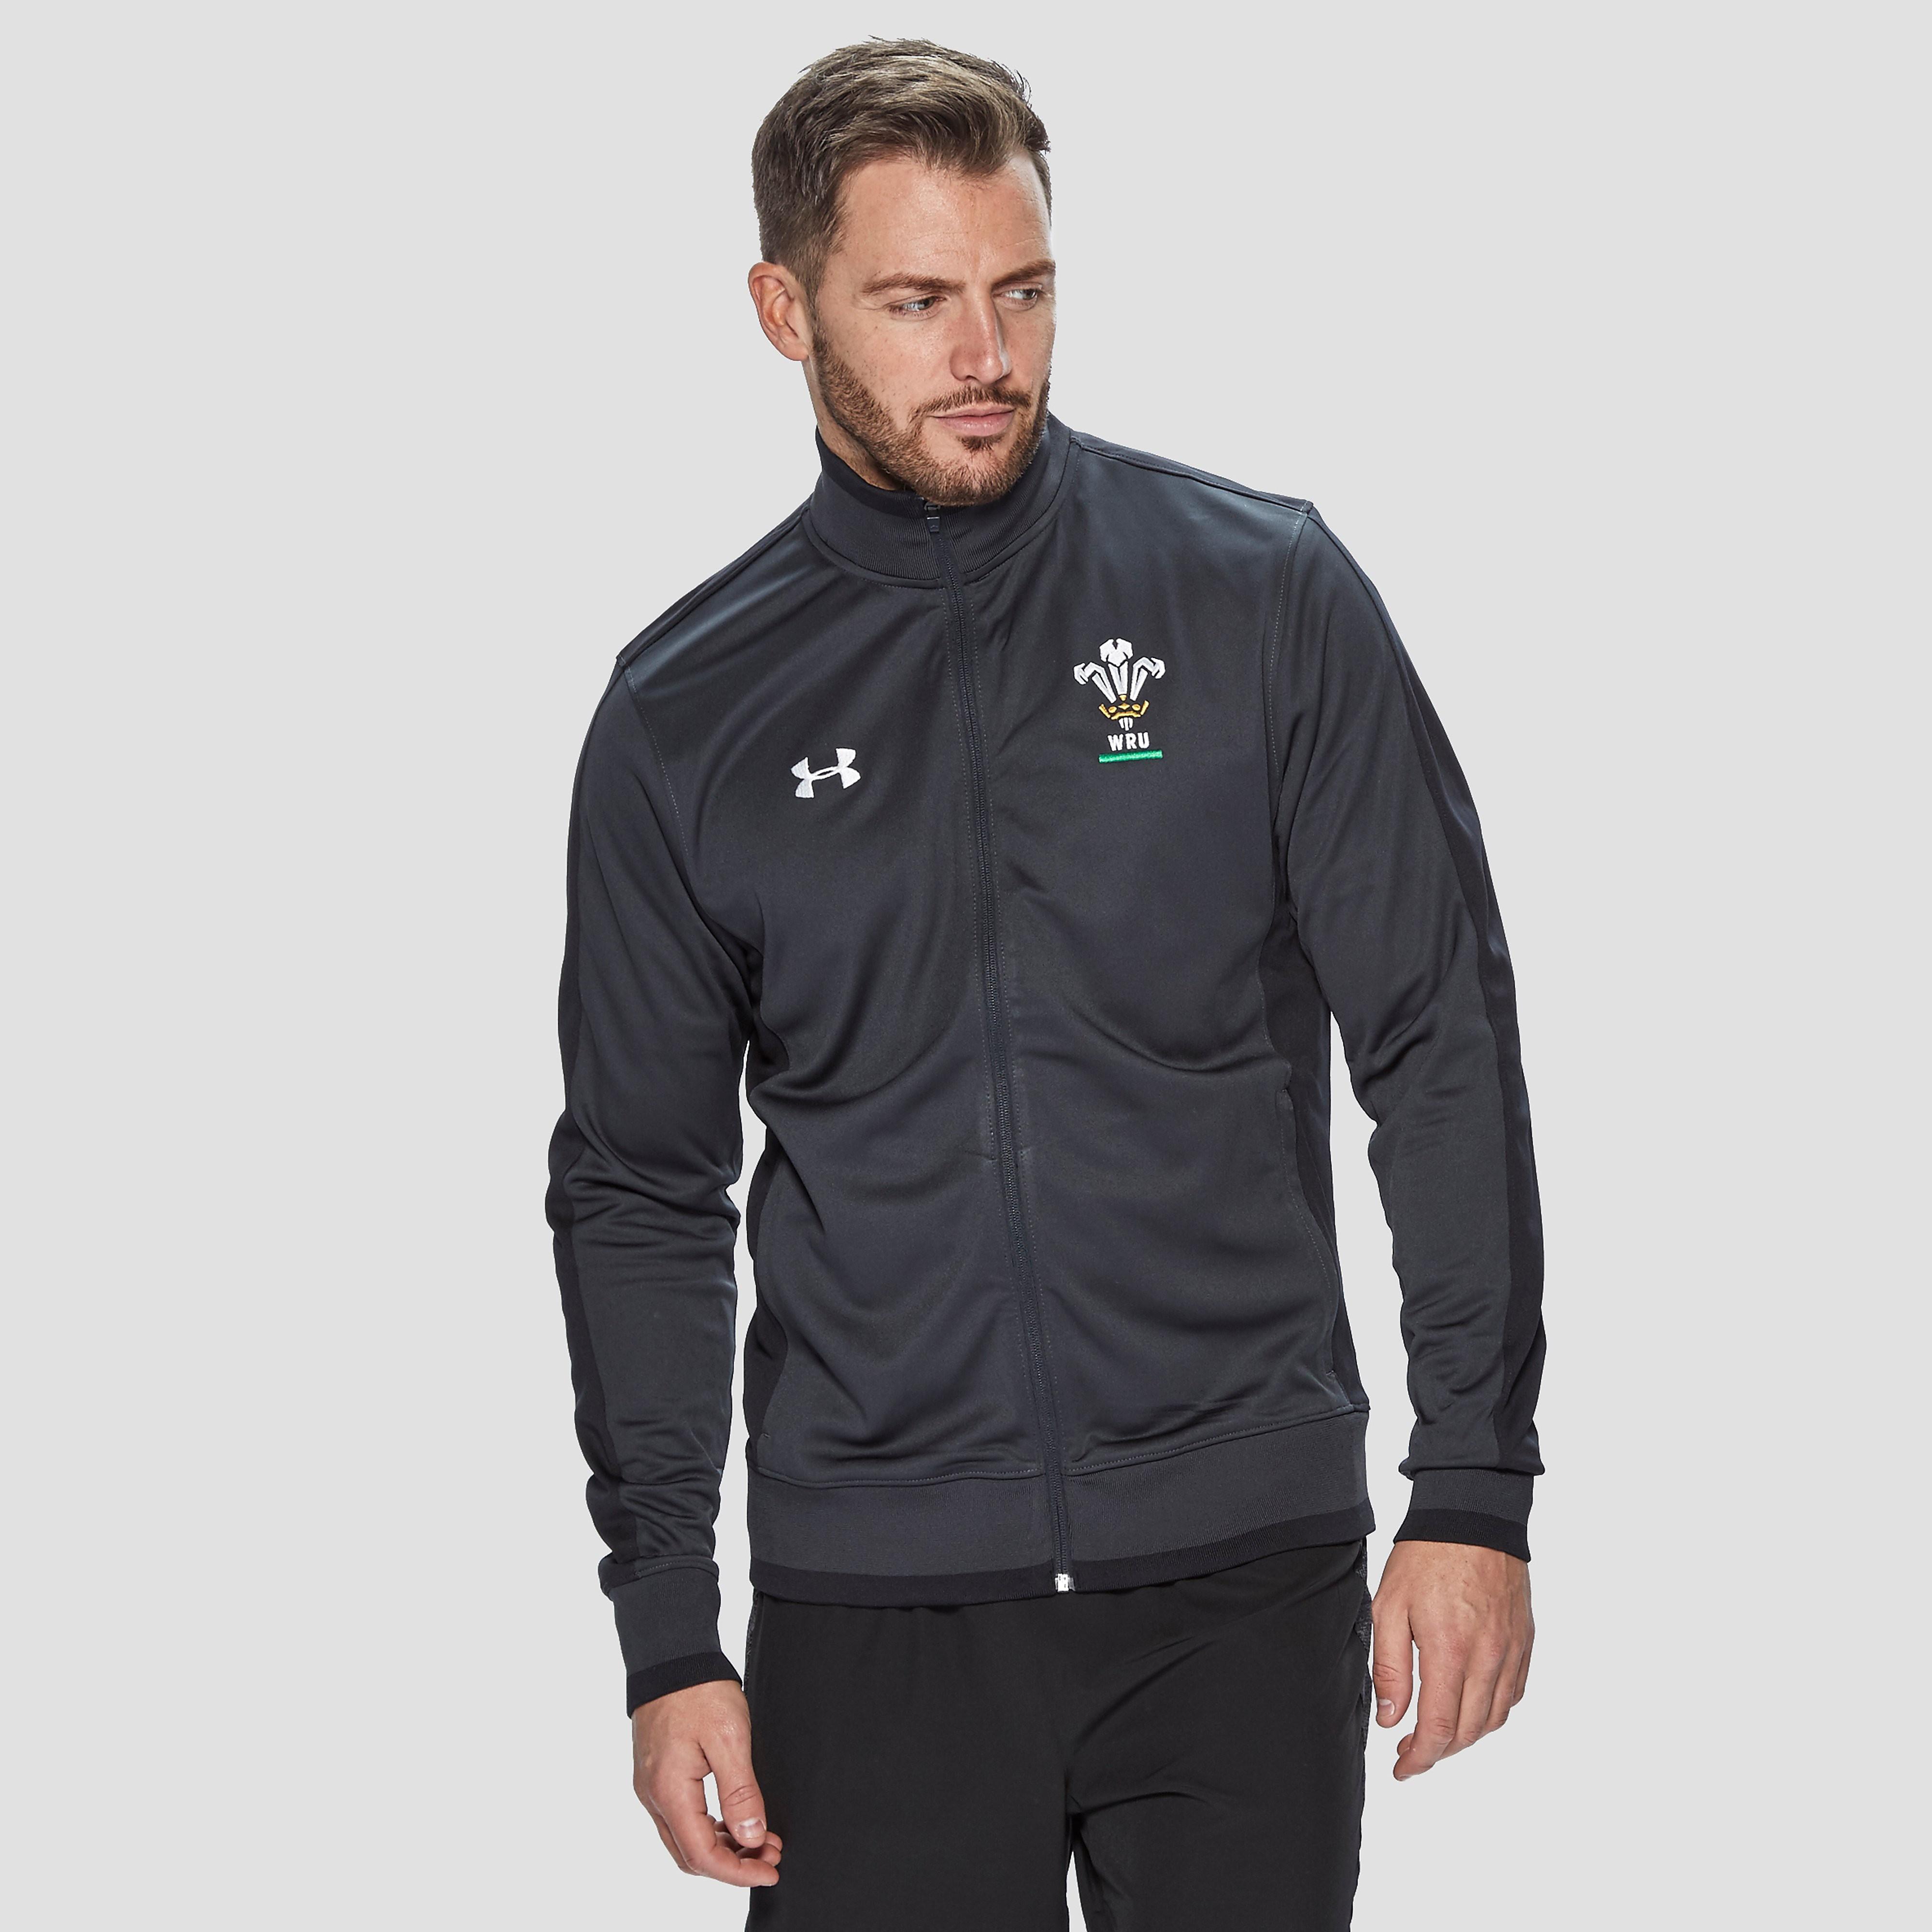 Under Armour Wales RU Men's Track Jacket